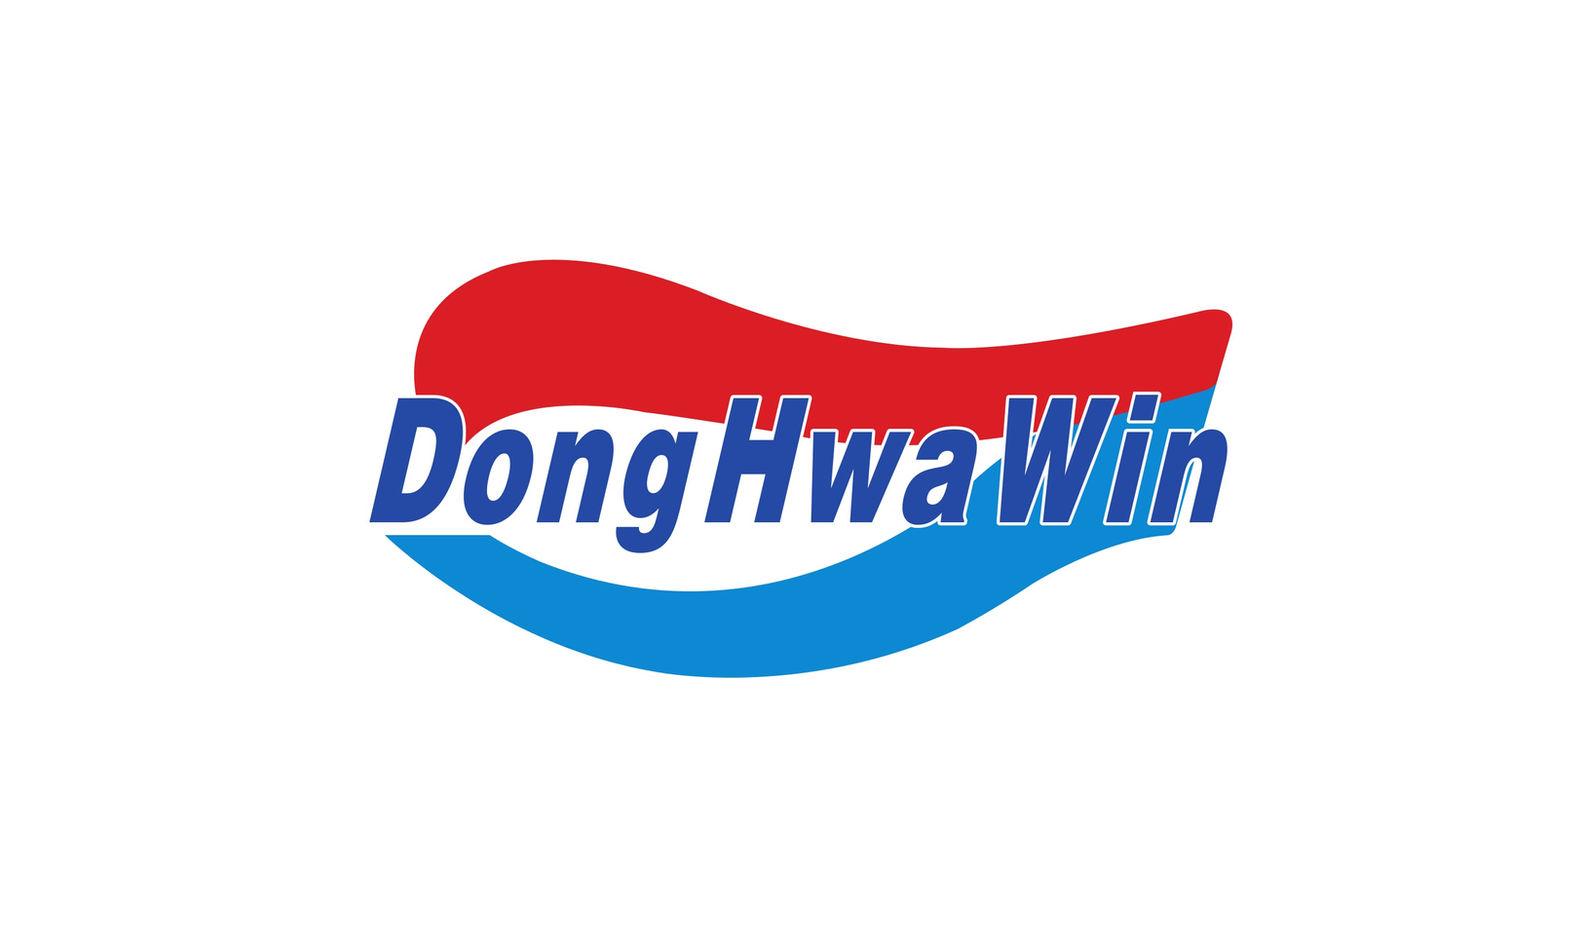 Donghwa win Logo.JPG